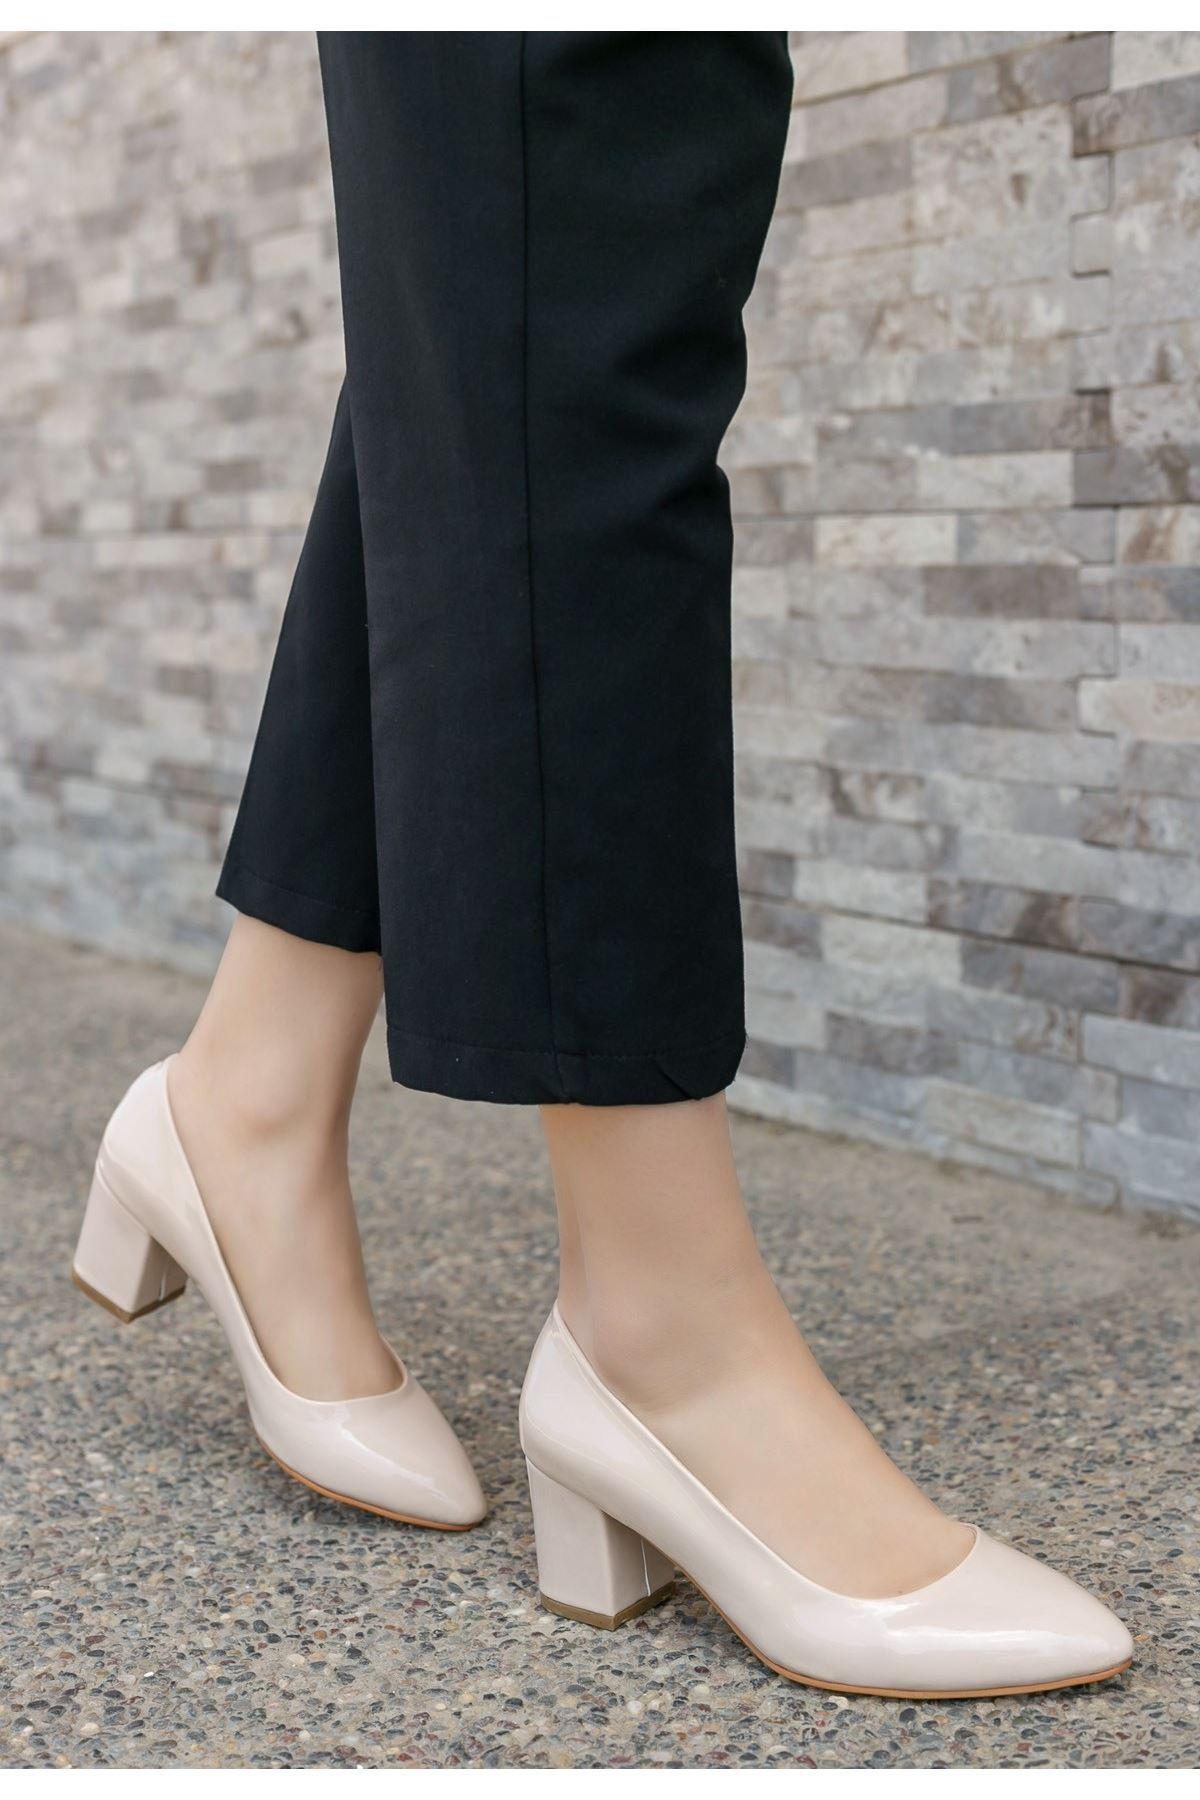 Lehisa Krem Rugan Topuklu Ayakkabı